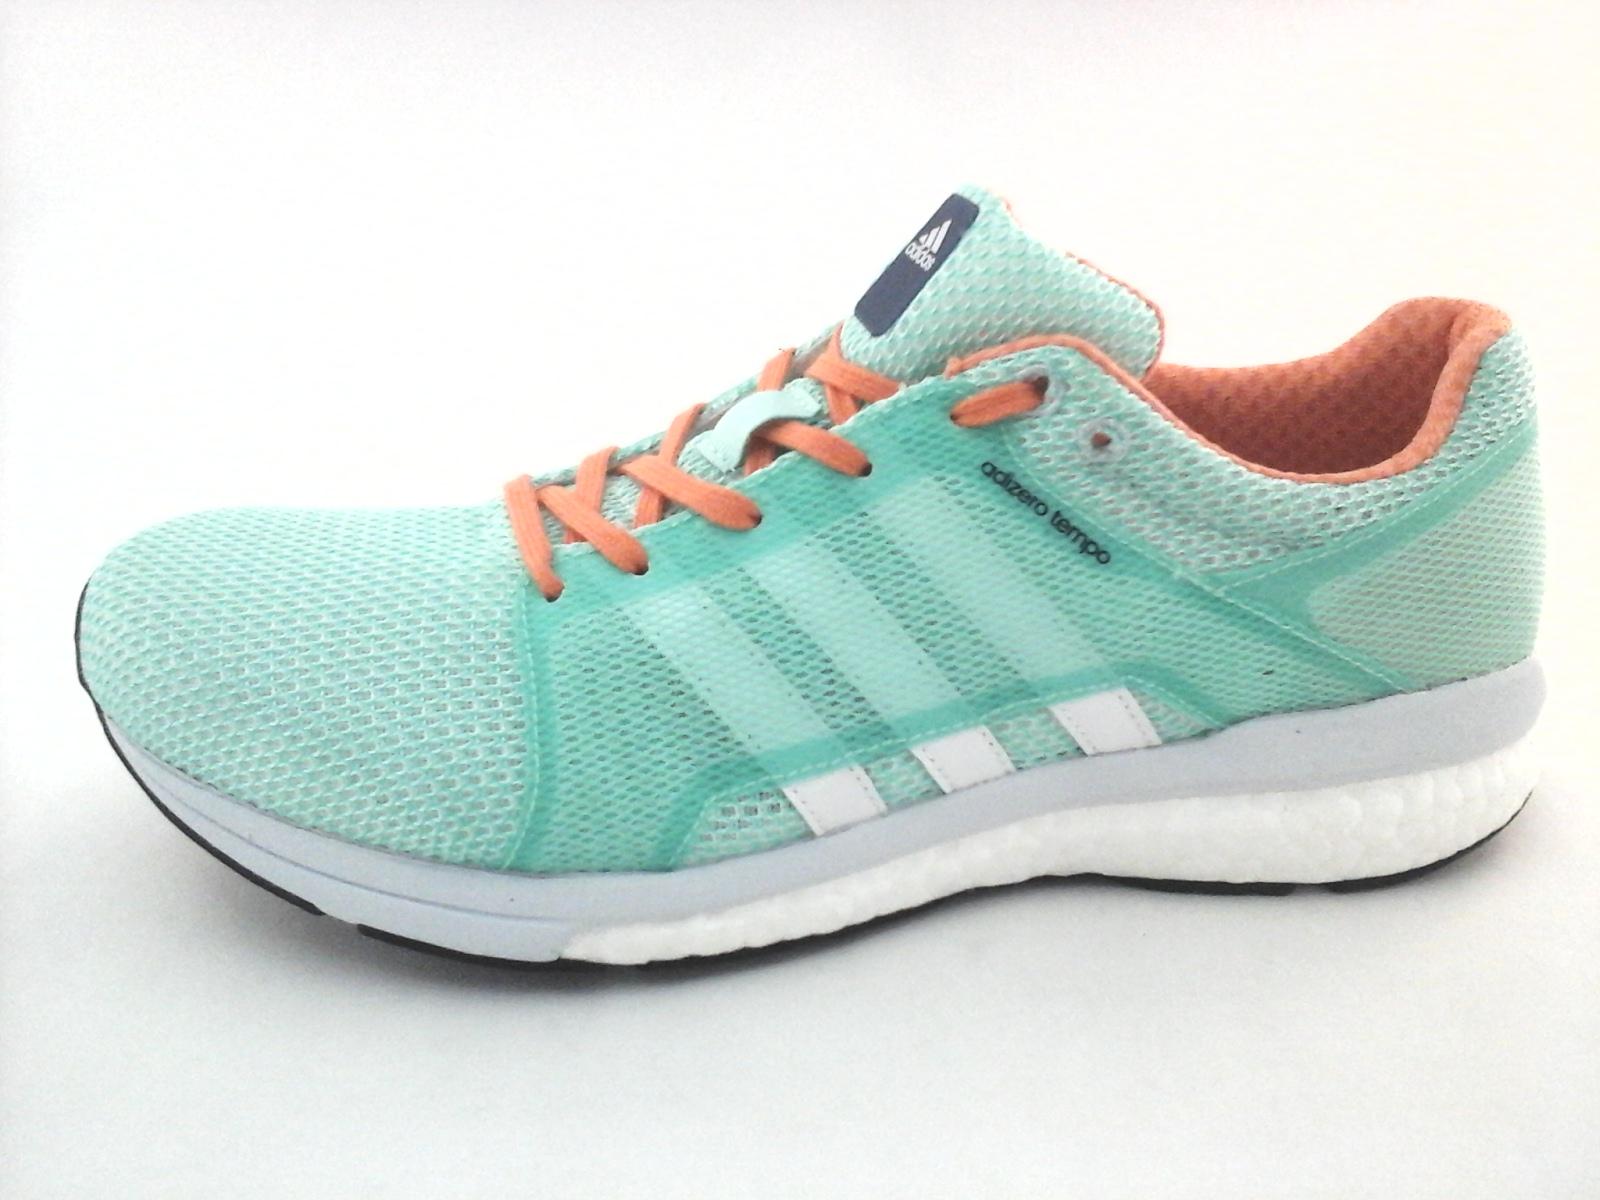 2e0e378e0e56 Adidas Adizero Tempo Boost BA8095 Women s Running Shoes Sneakers Green 8.5    12